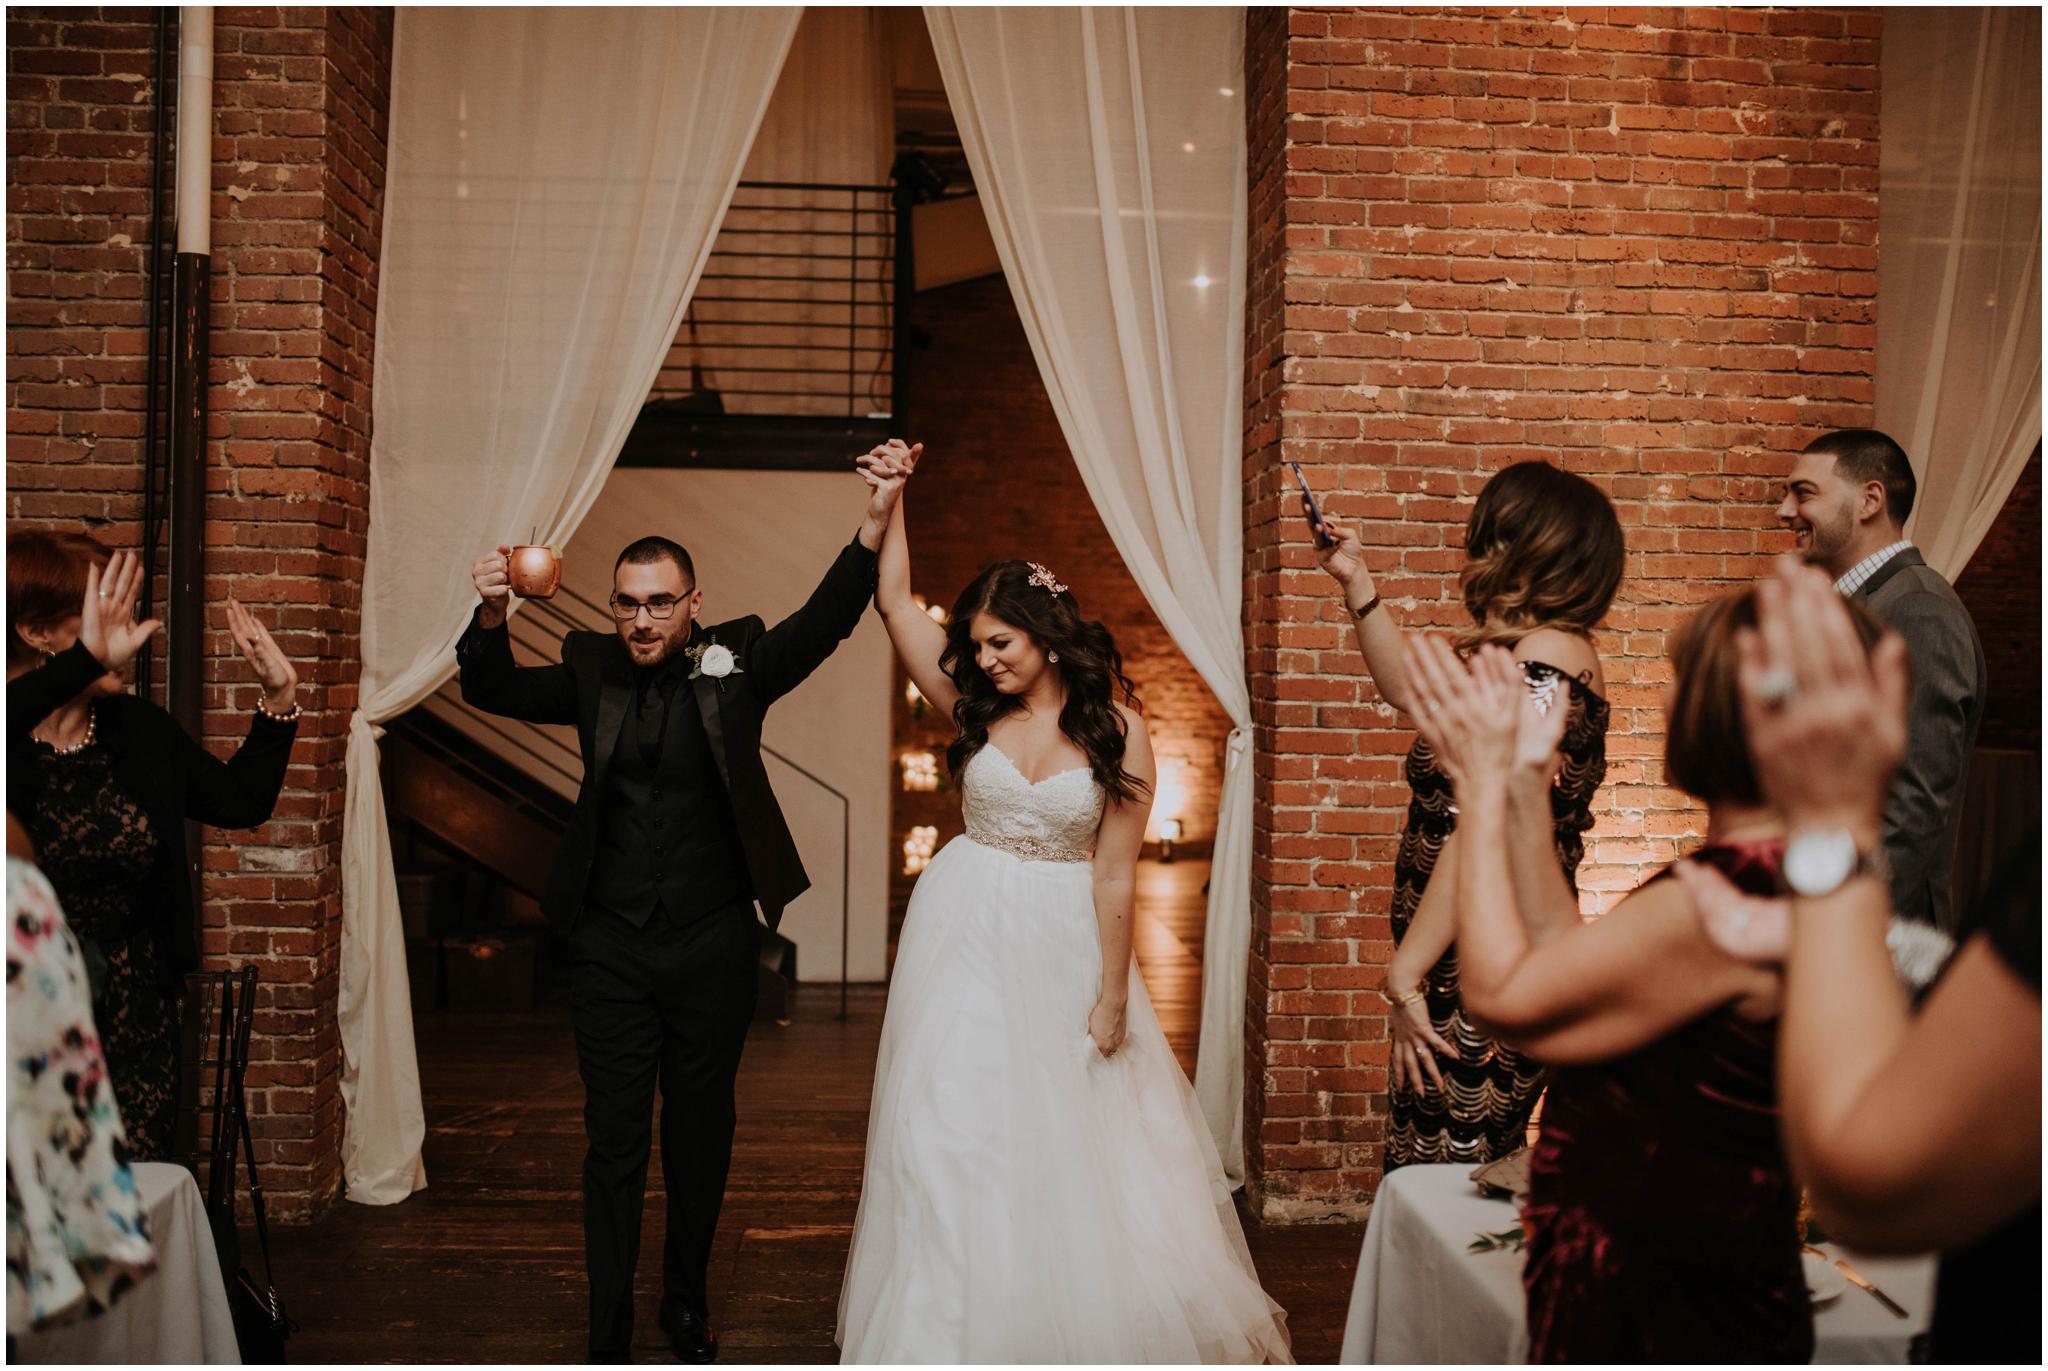 danny+mackenzie+downtown-seattle-axis-wedding-seattle-photographer-101.jpg